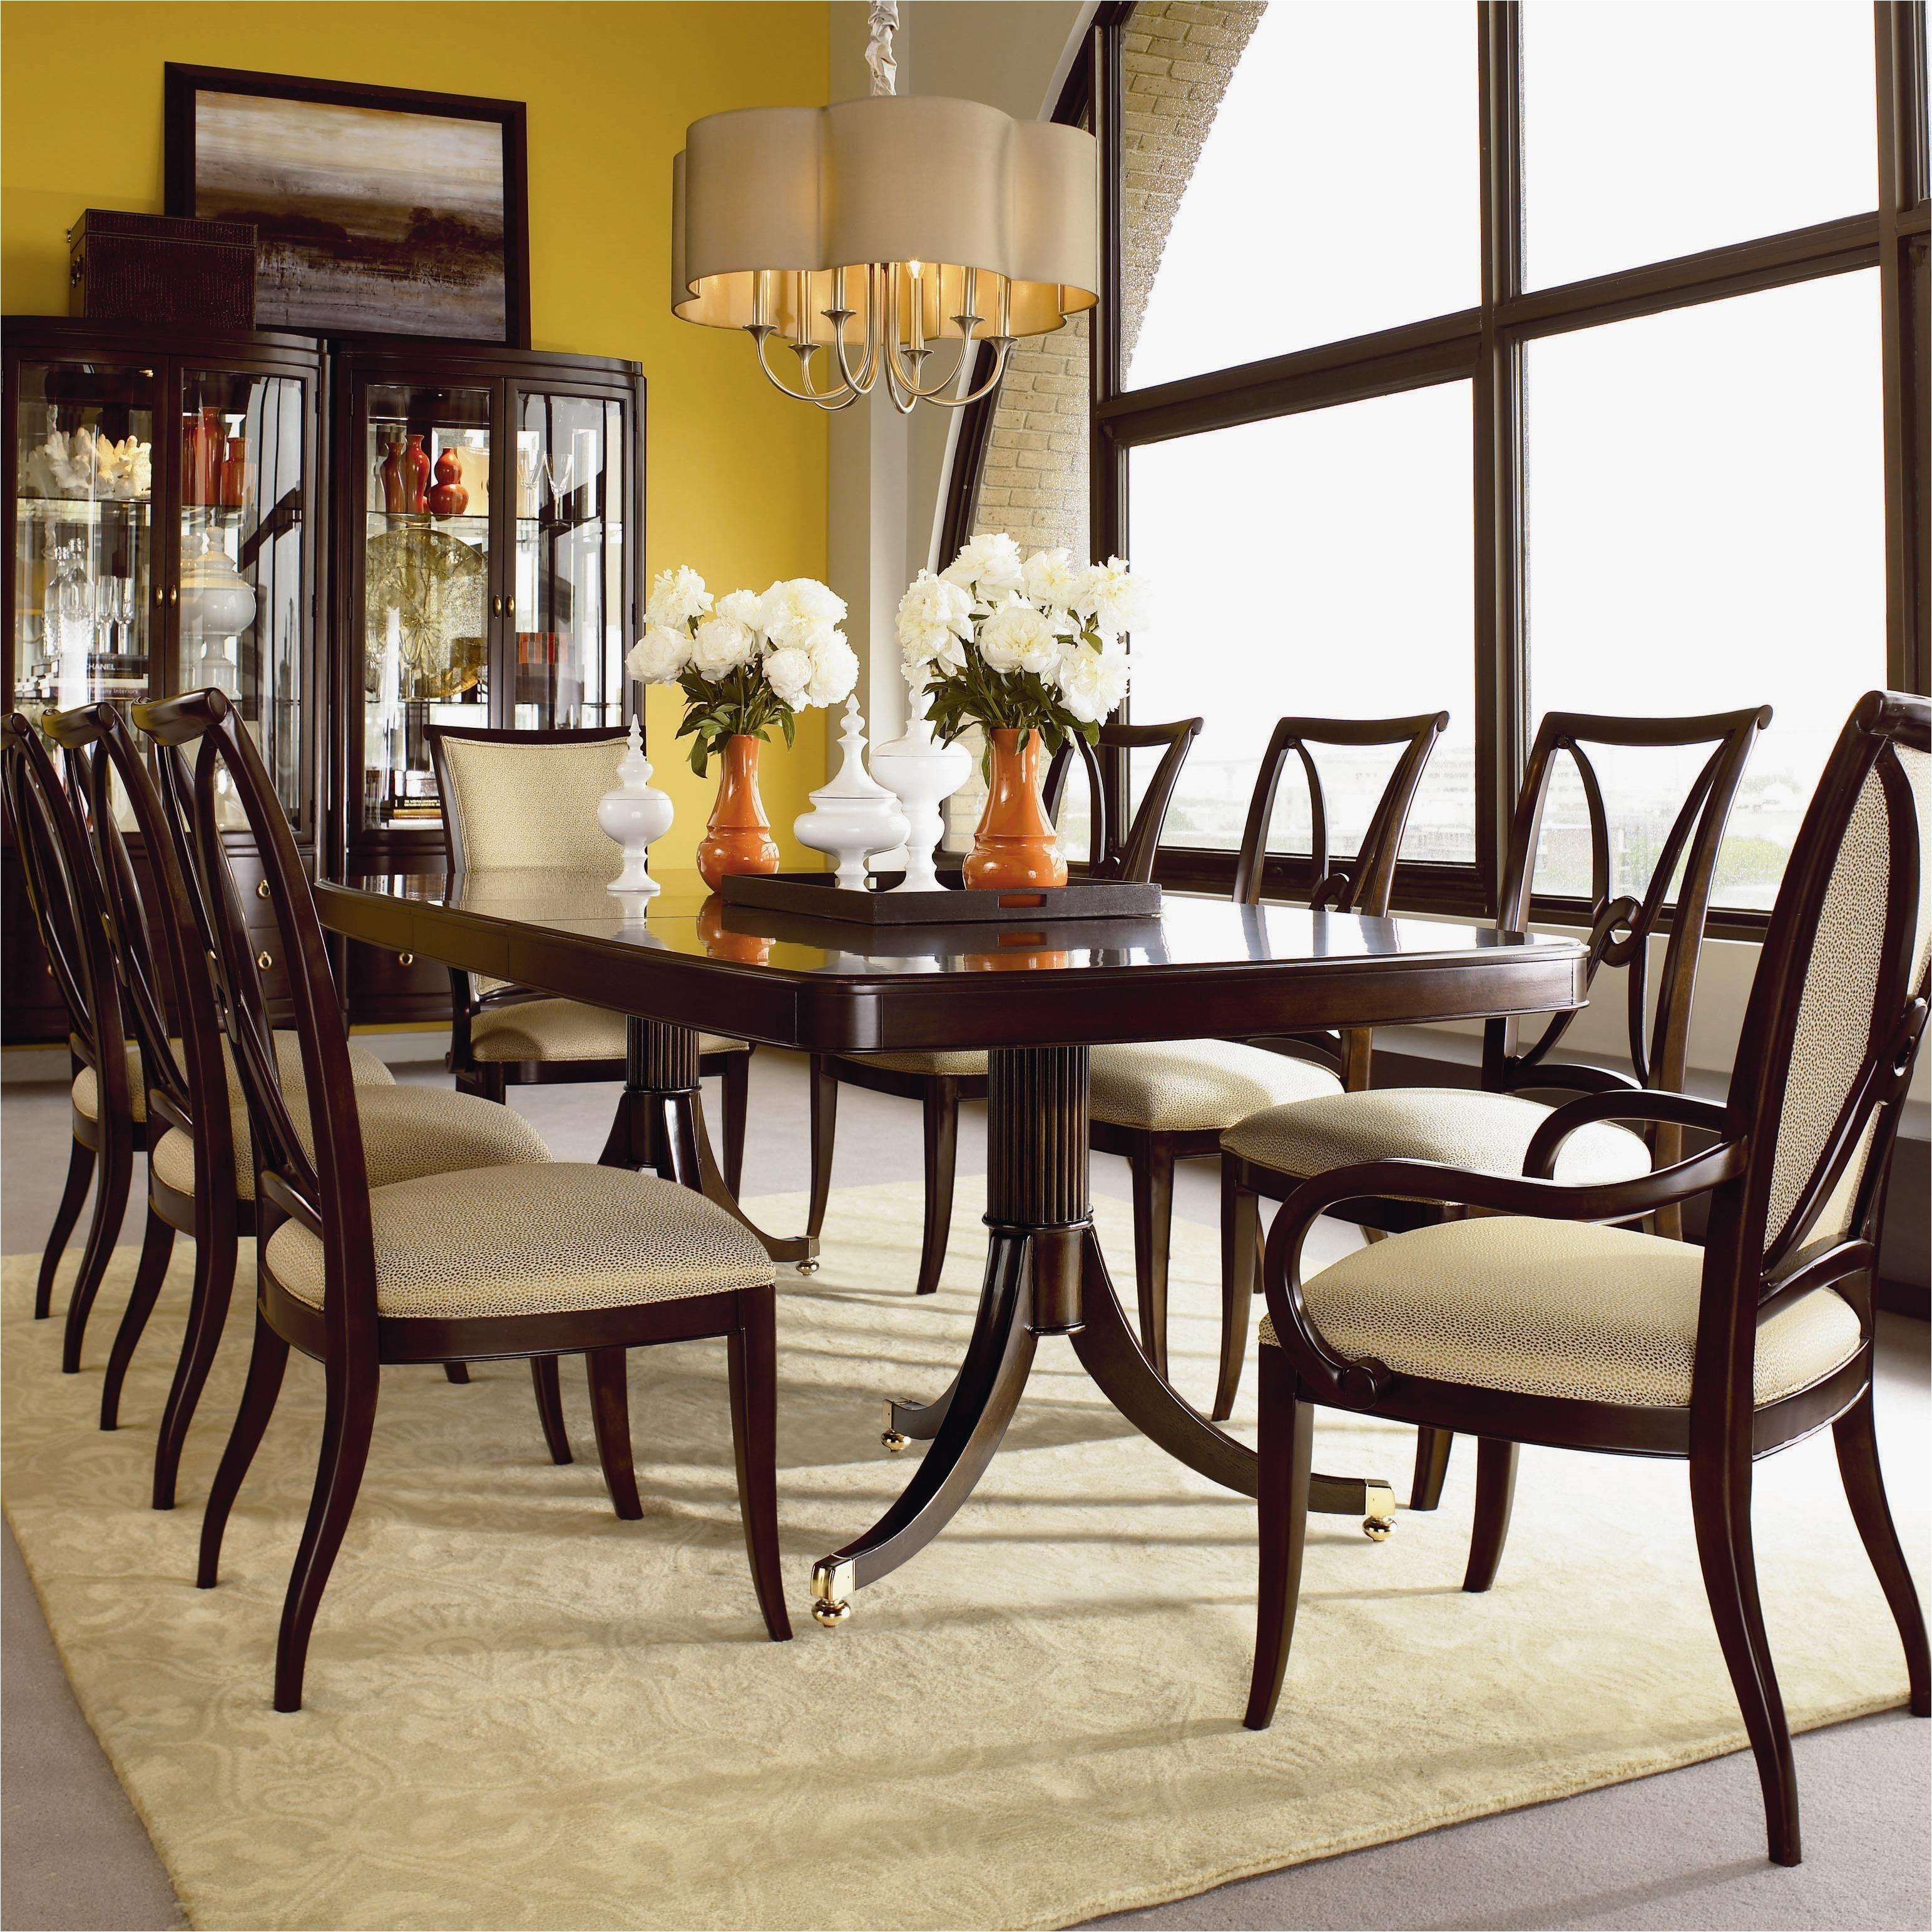 art van living room furniture inspirational art van dining room inspirational mobel yellow living room lounge